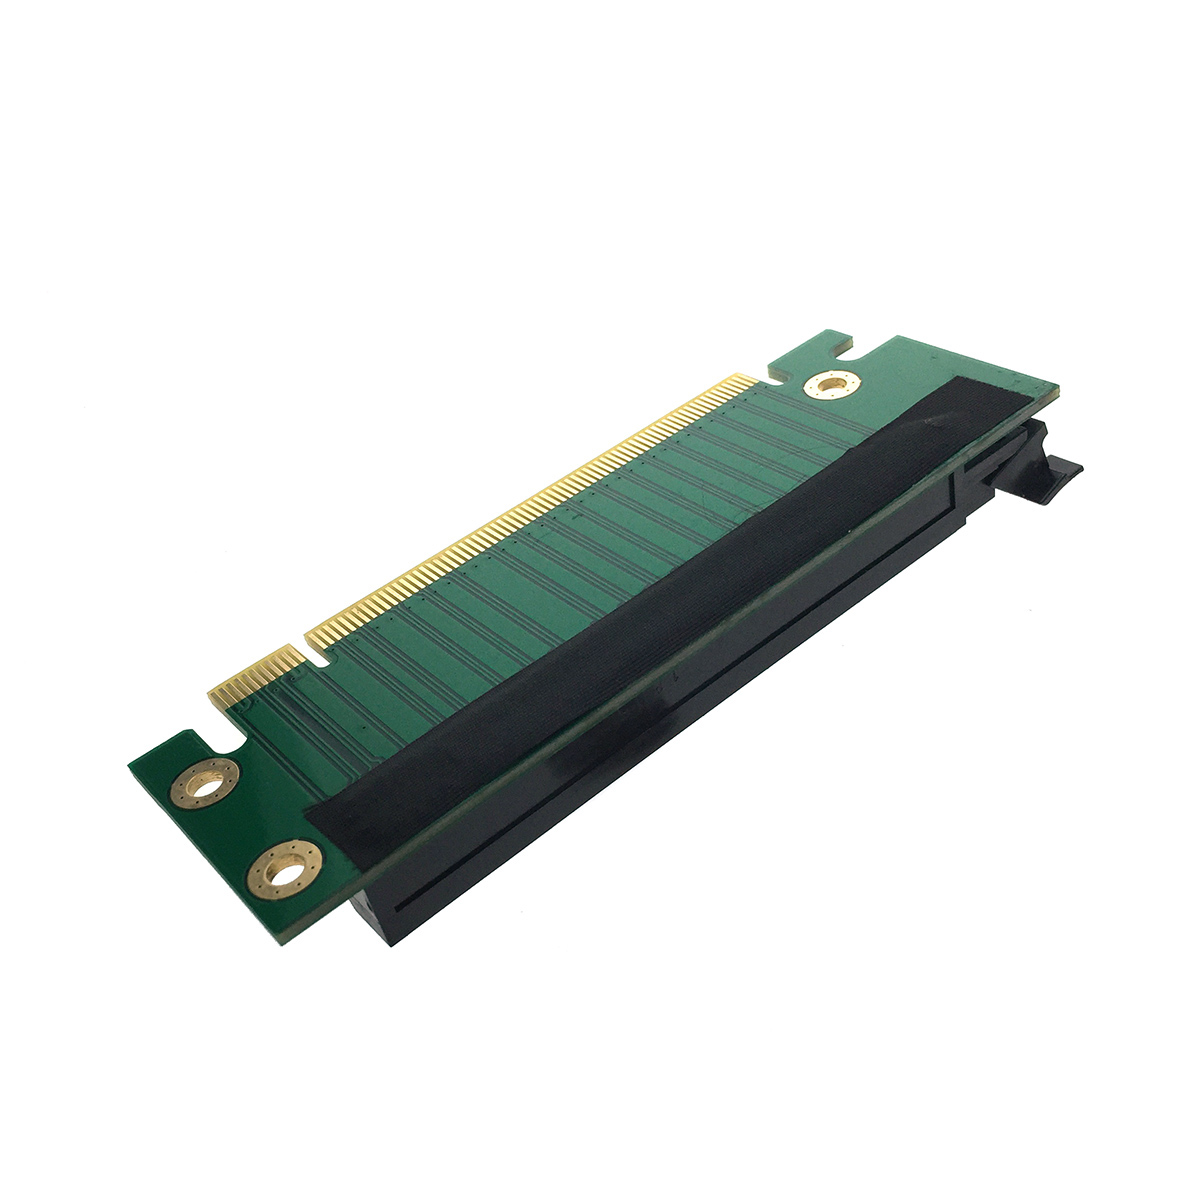 Переходник PCI-E X16 M to PCI-E X16 F, 90° угловой 2U, EPCIE162U